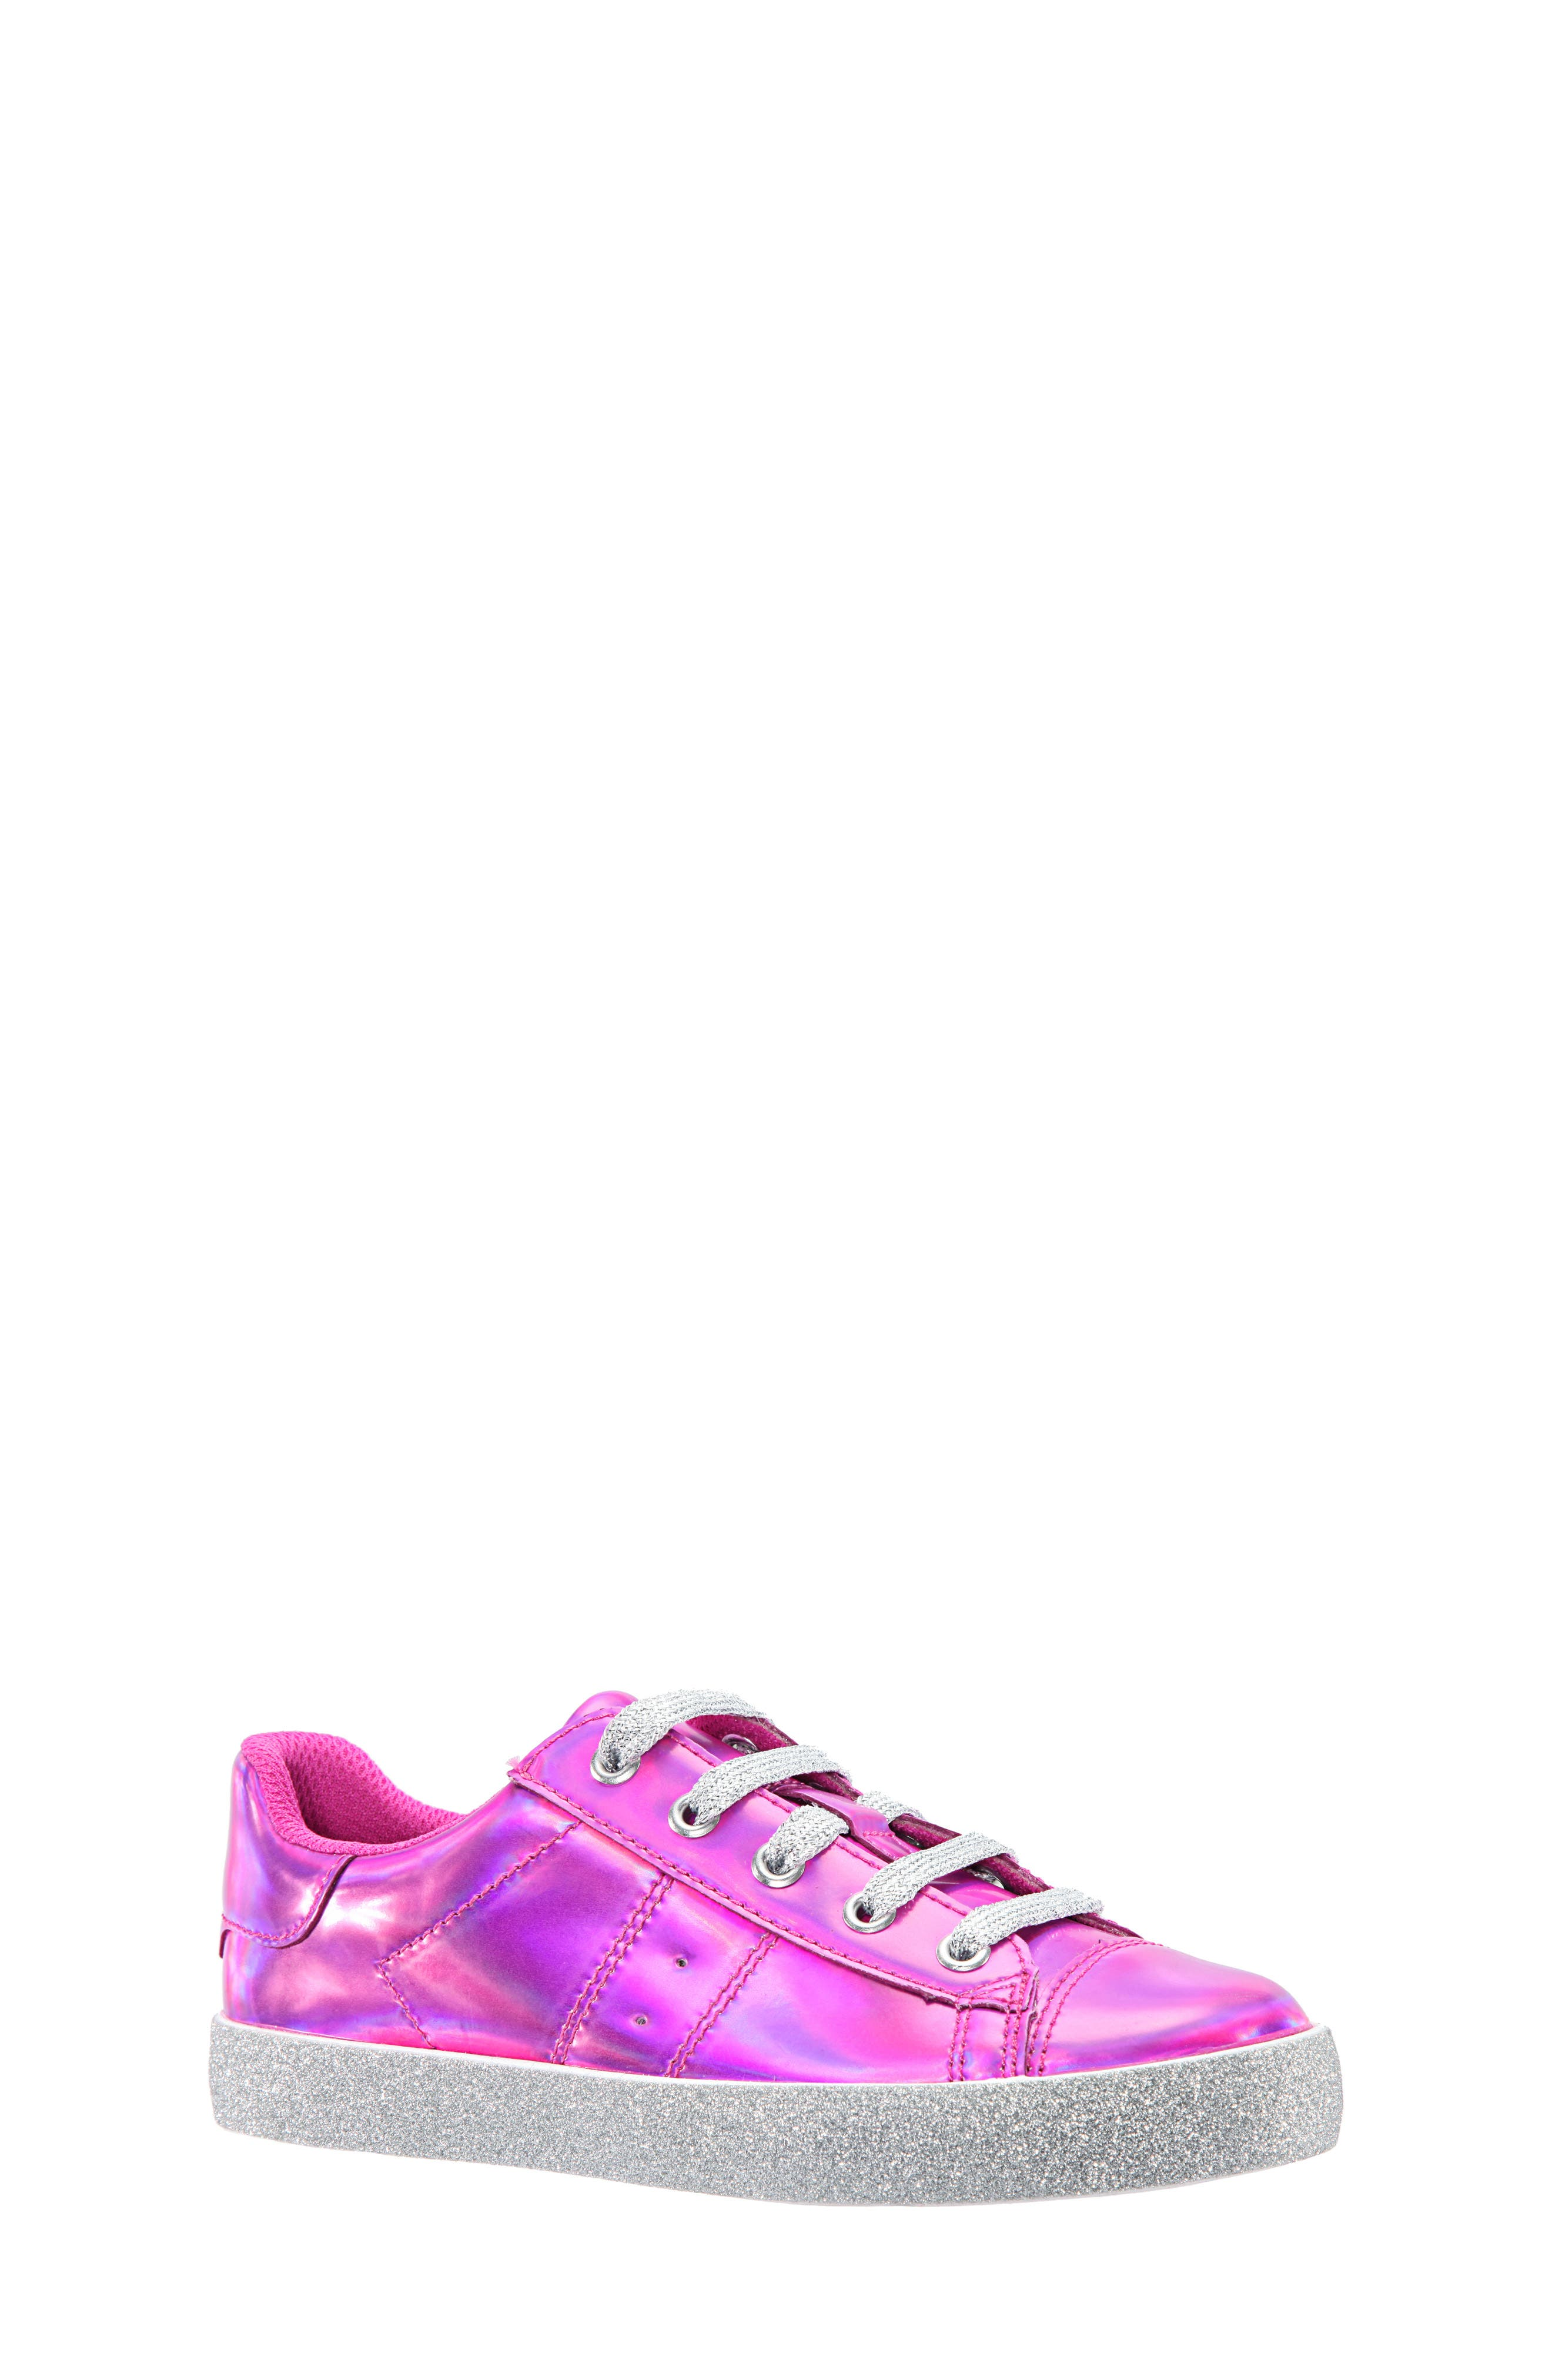 Jovana Glitter Low-Top Sneaker,                             Main thumbnail 1, color,                             Pink Patent